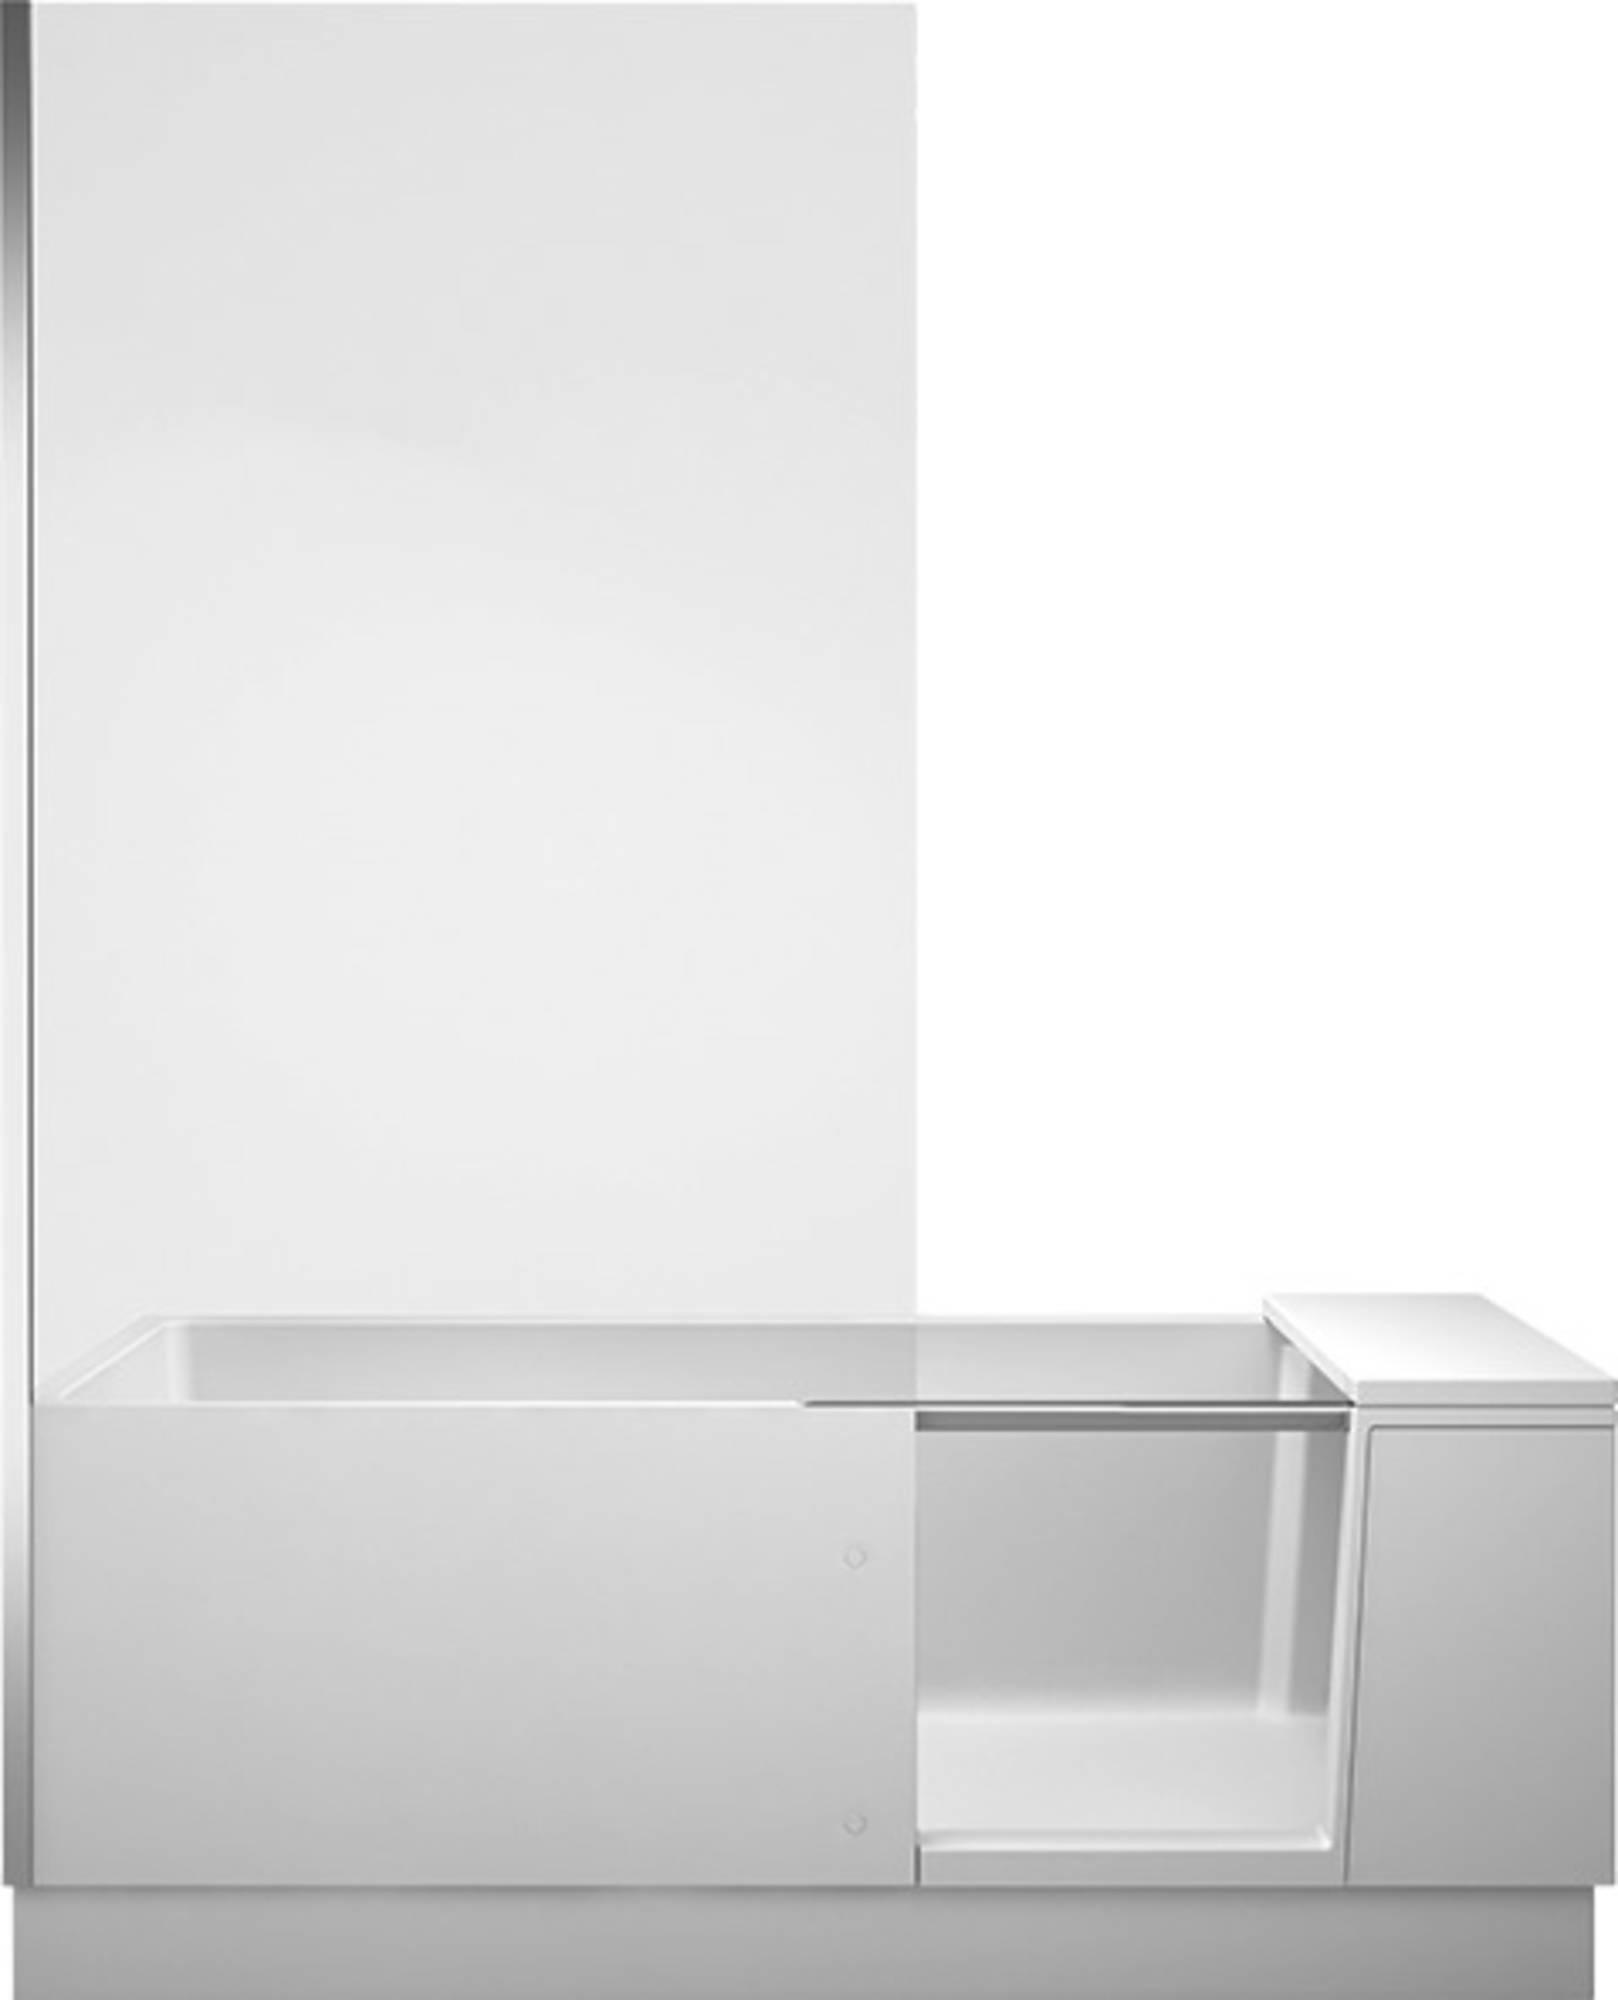 Duravit Shower + Bath Bad met Gemonteerde Deur Rechts 170x75 cm Wit spiegelglas